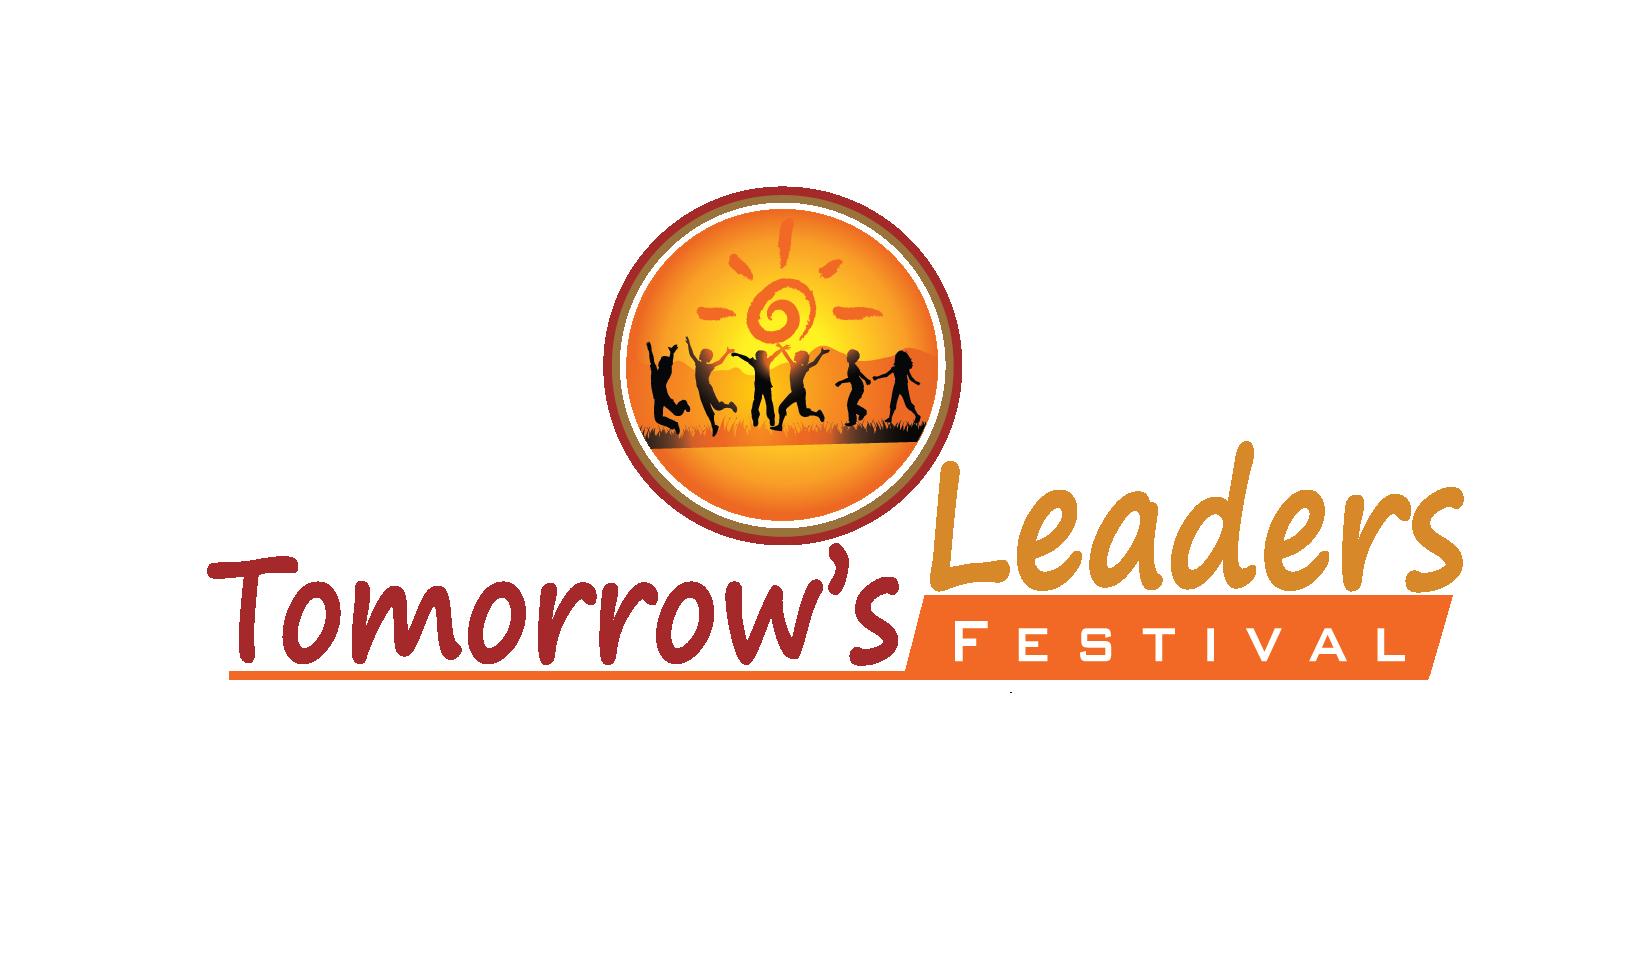 Tomorrow's Leaders Festival